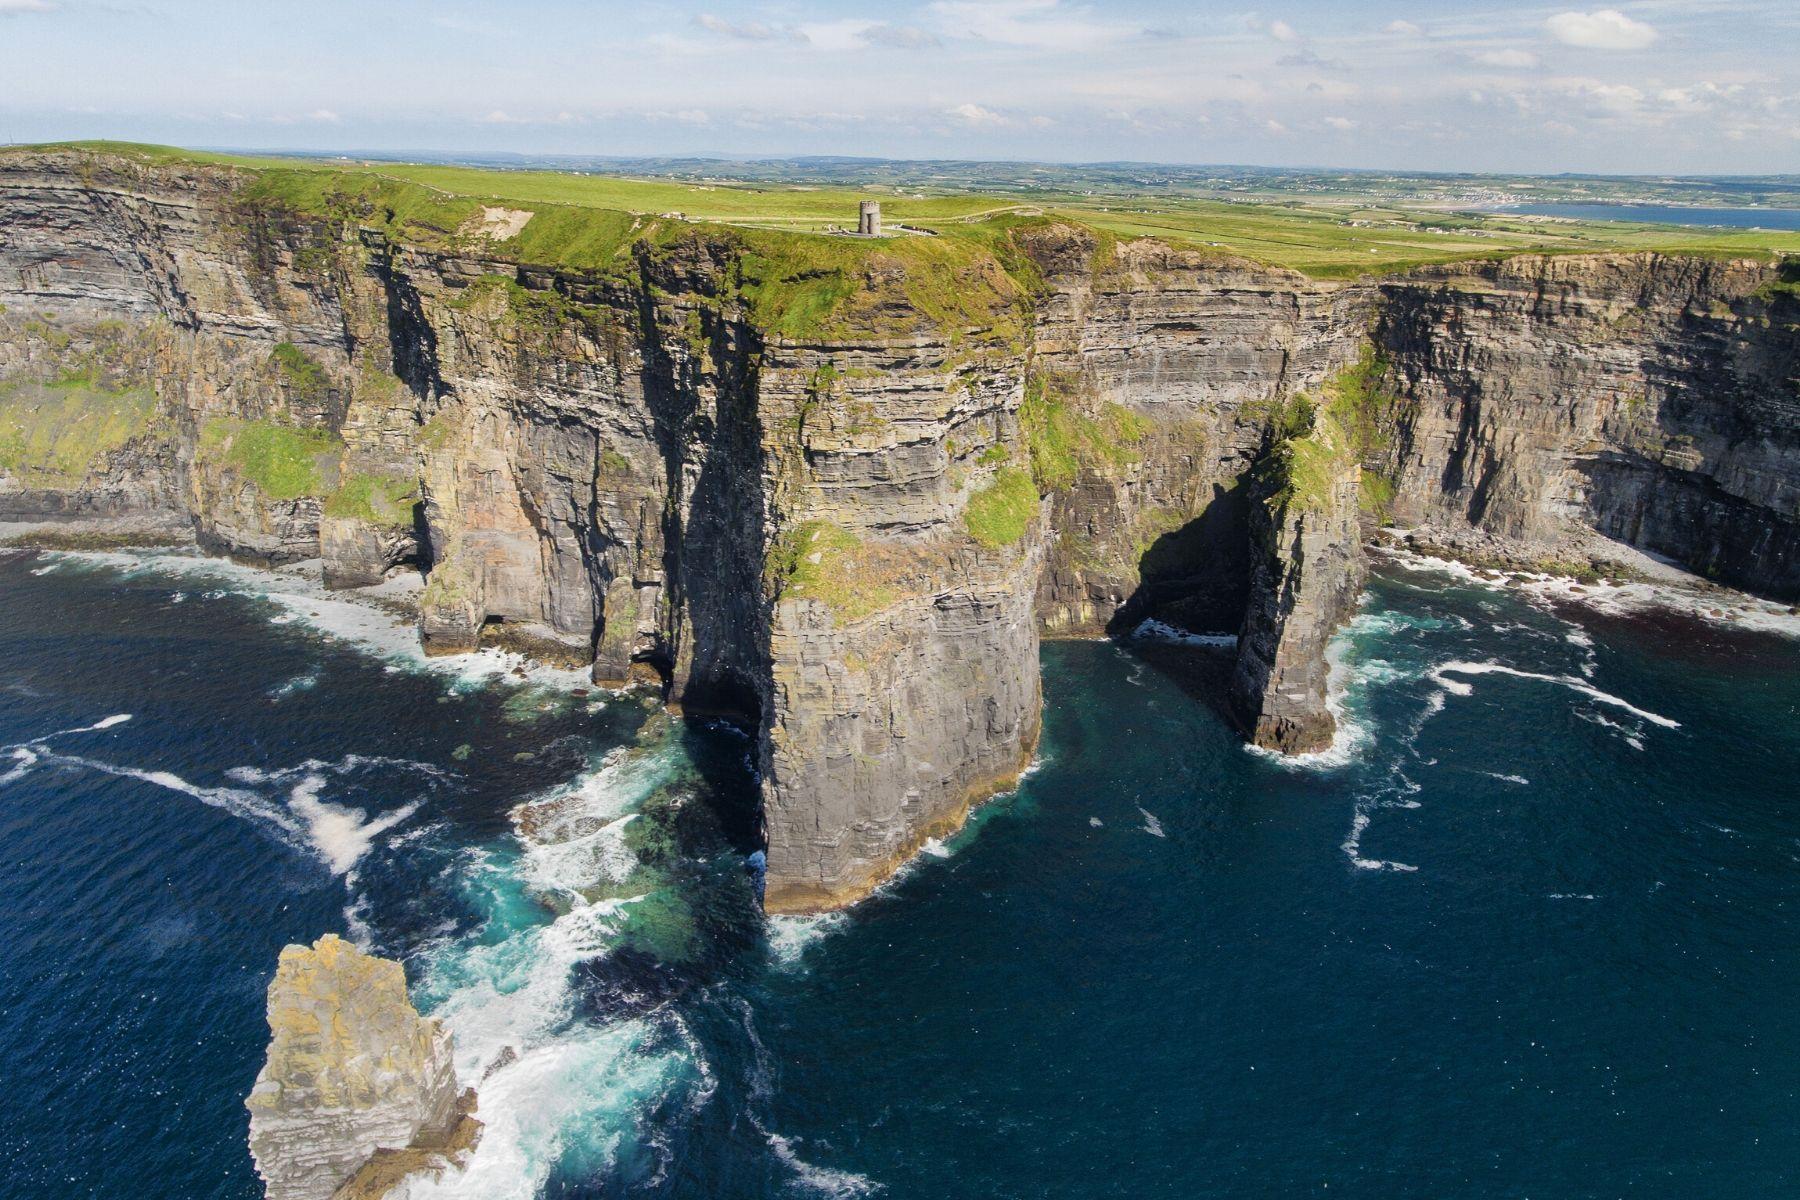 ireland's dramatic scenery